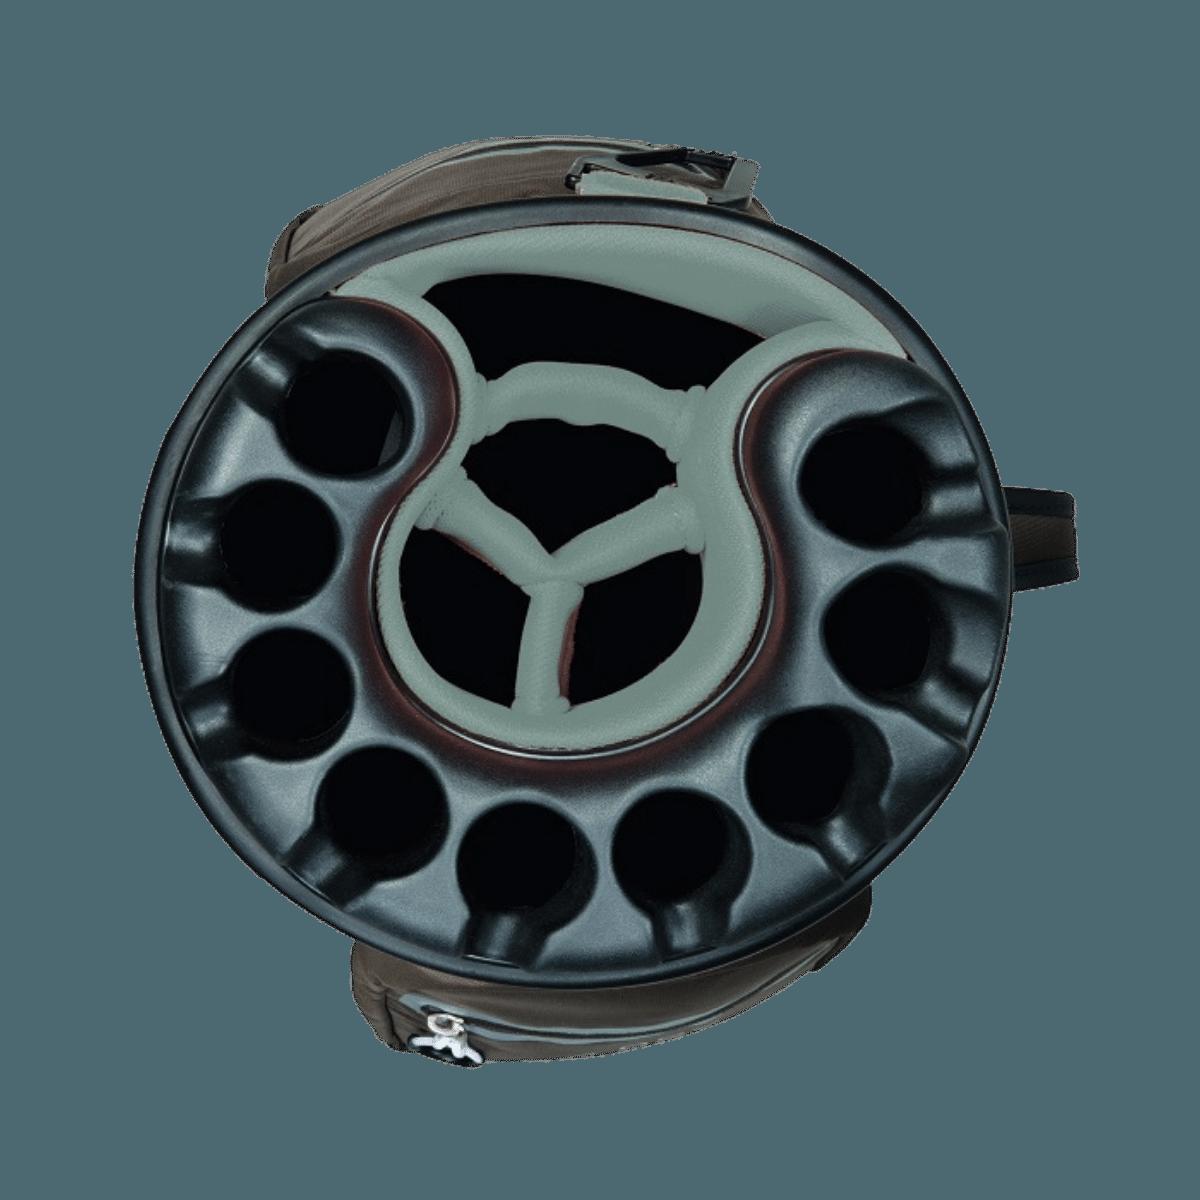 Cartbag QO9 Classic Waterproof